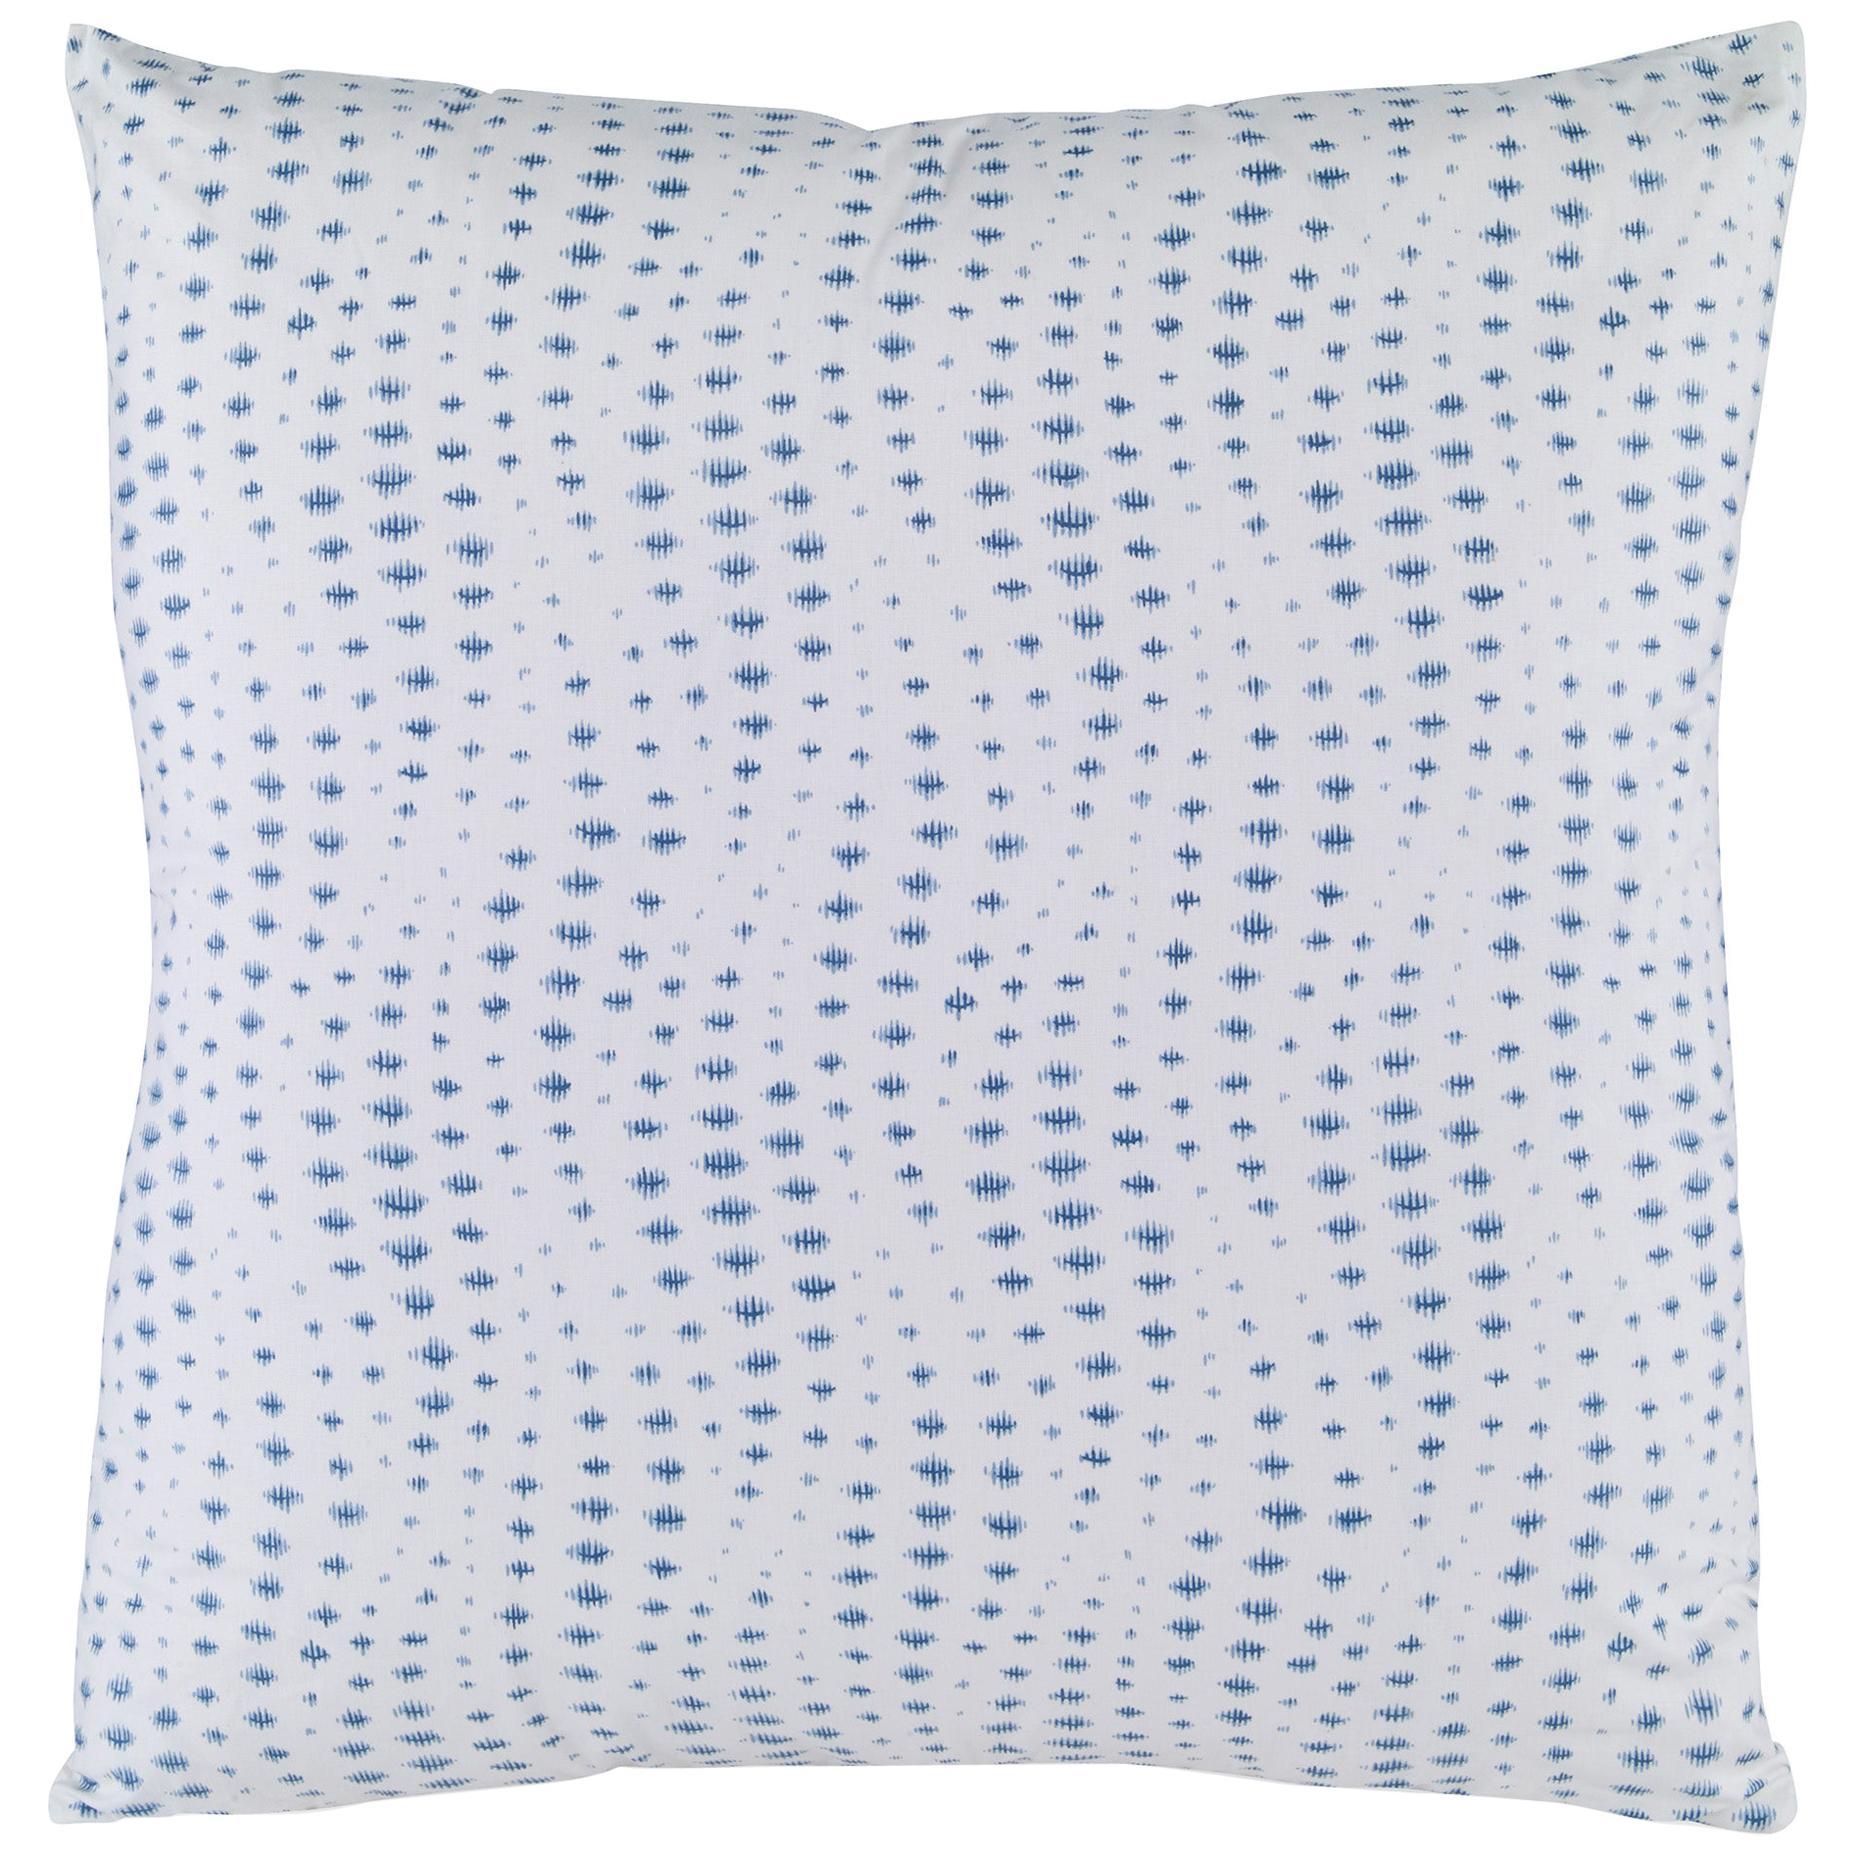 Rippledrop Pillow in Ultramarine by CuratedKravet